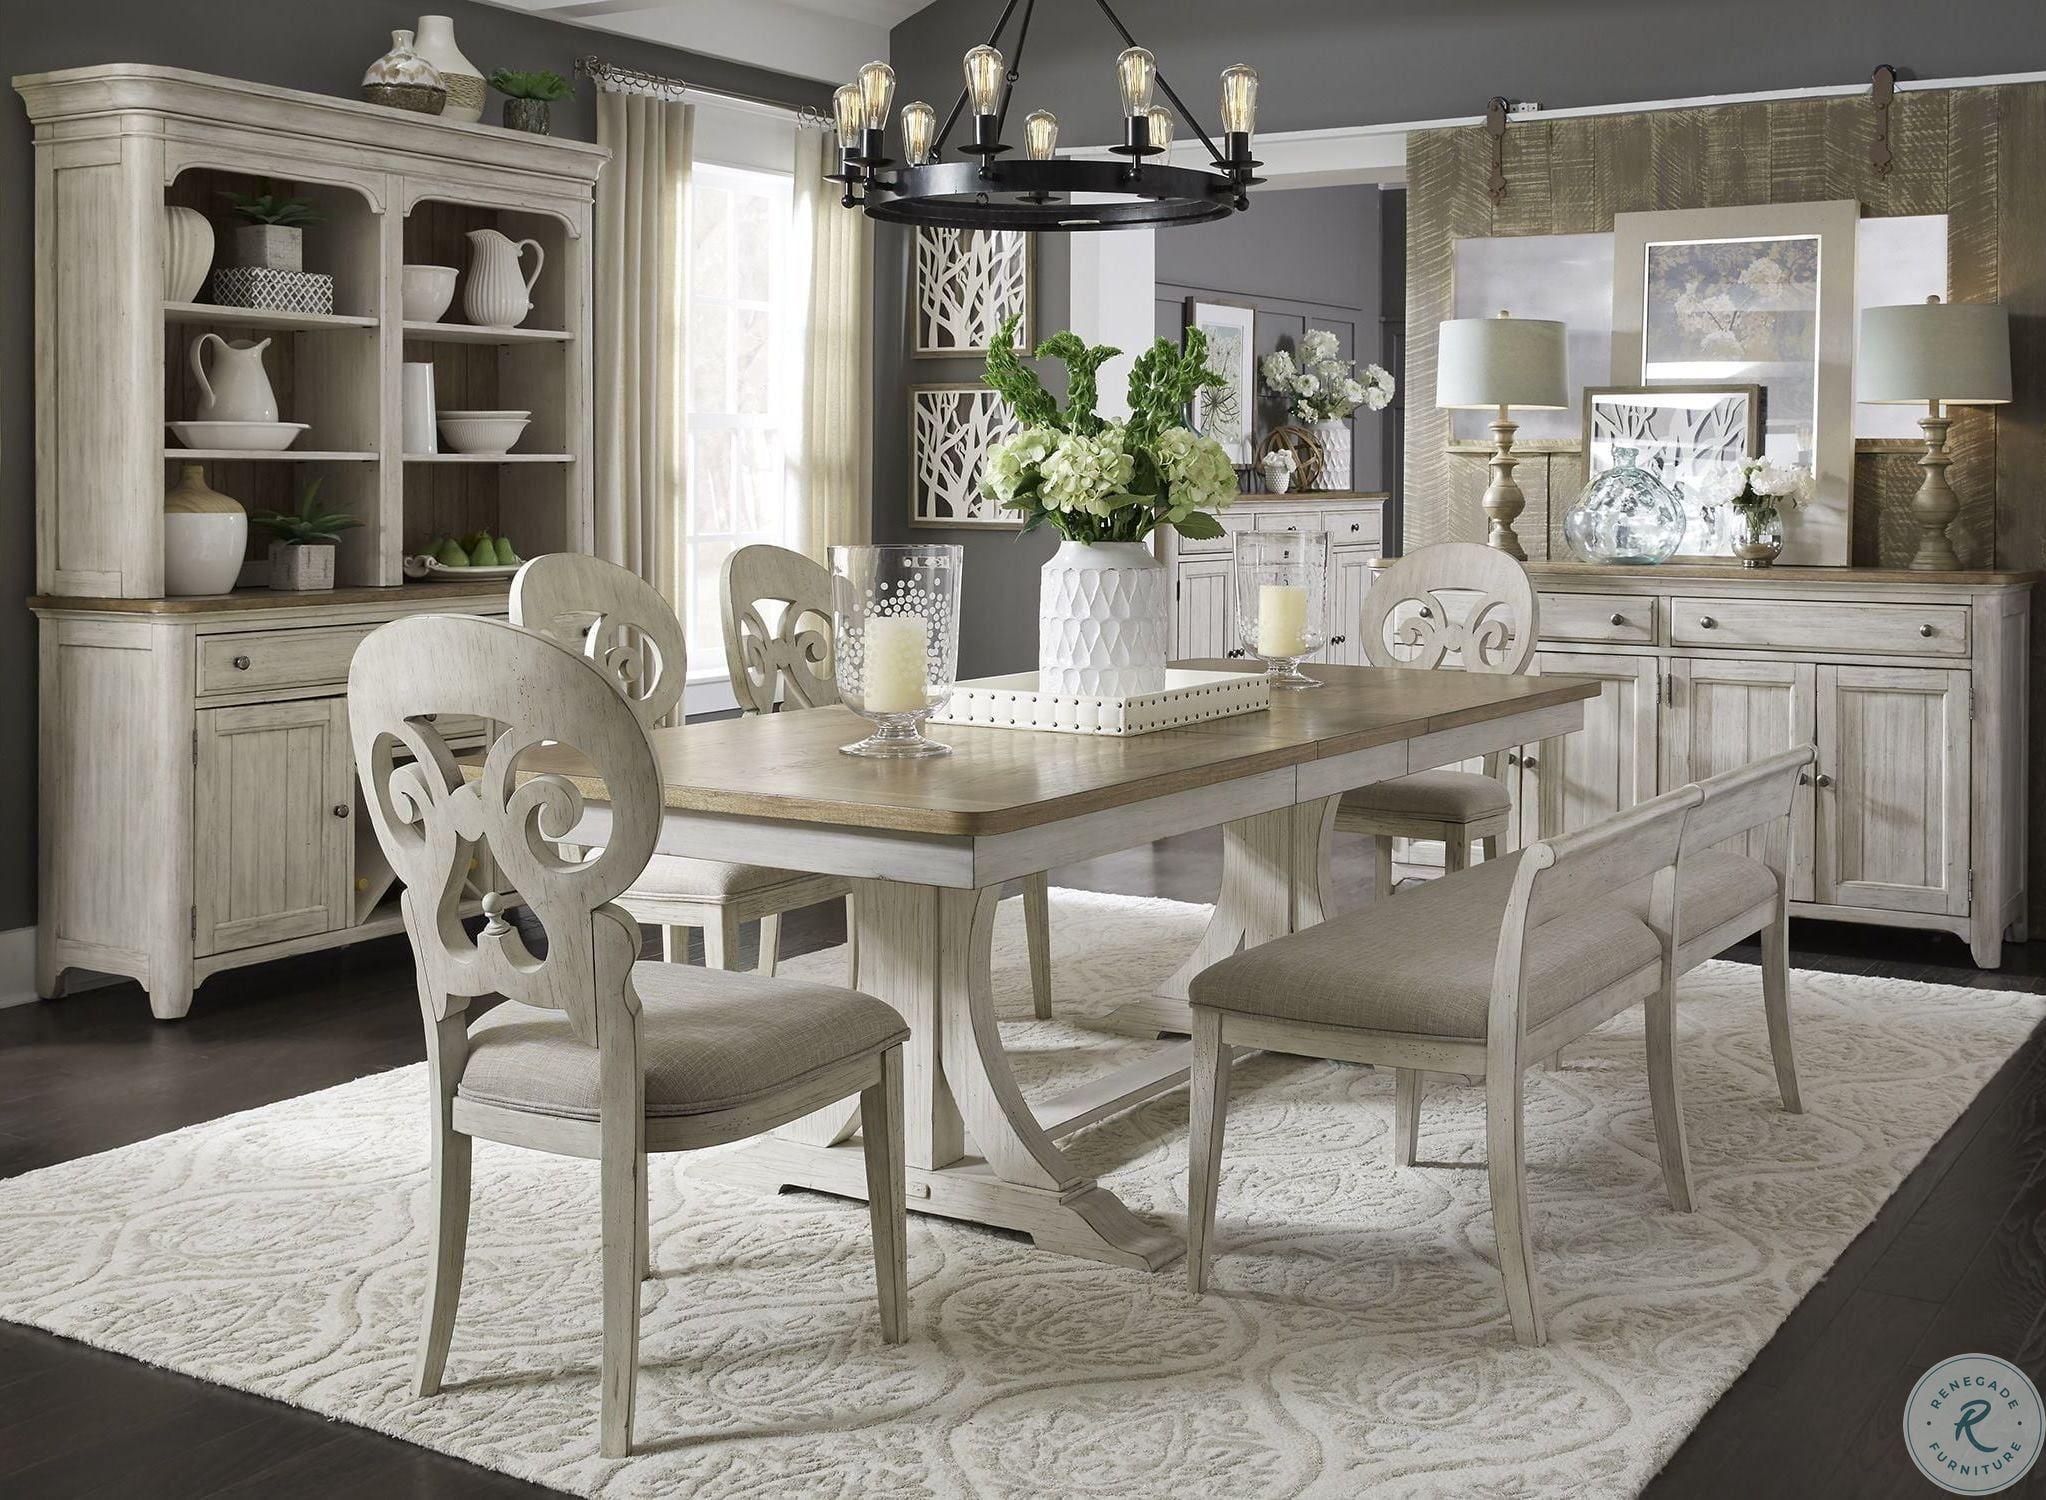 Farmhouse Reimagined Antique White, Farmhouse Dining Room Furniture Sets